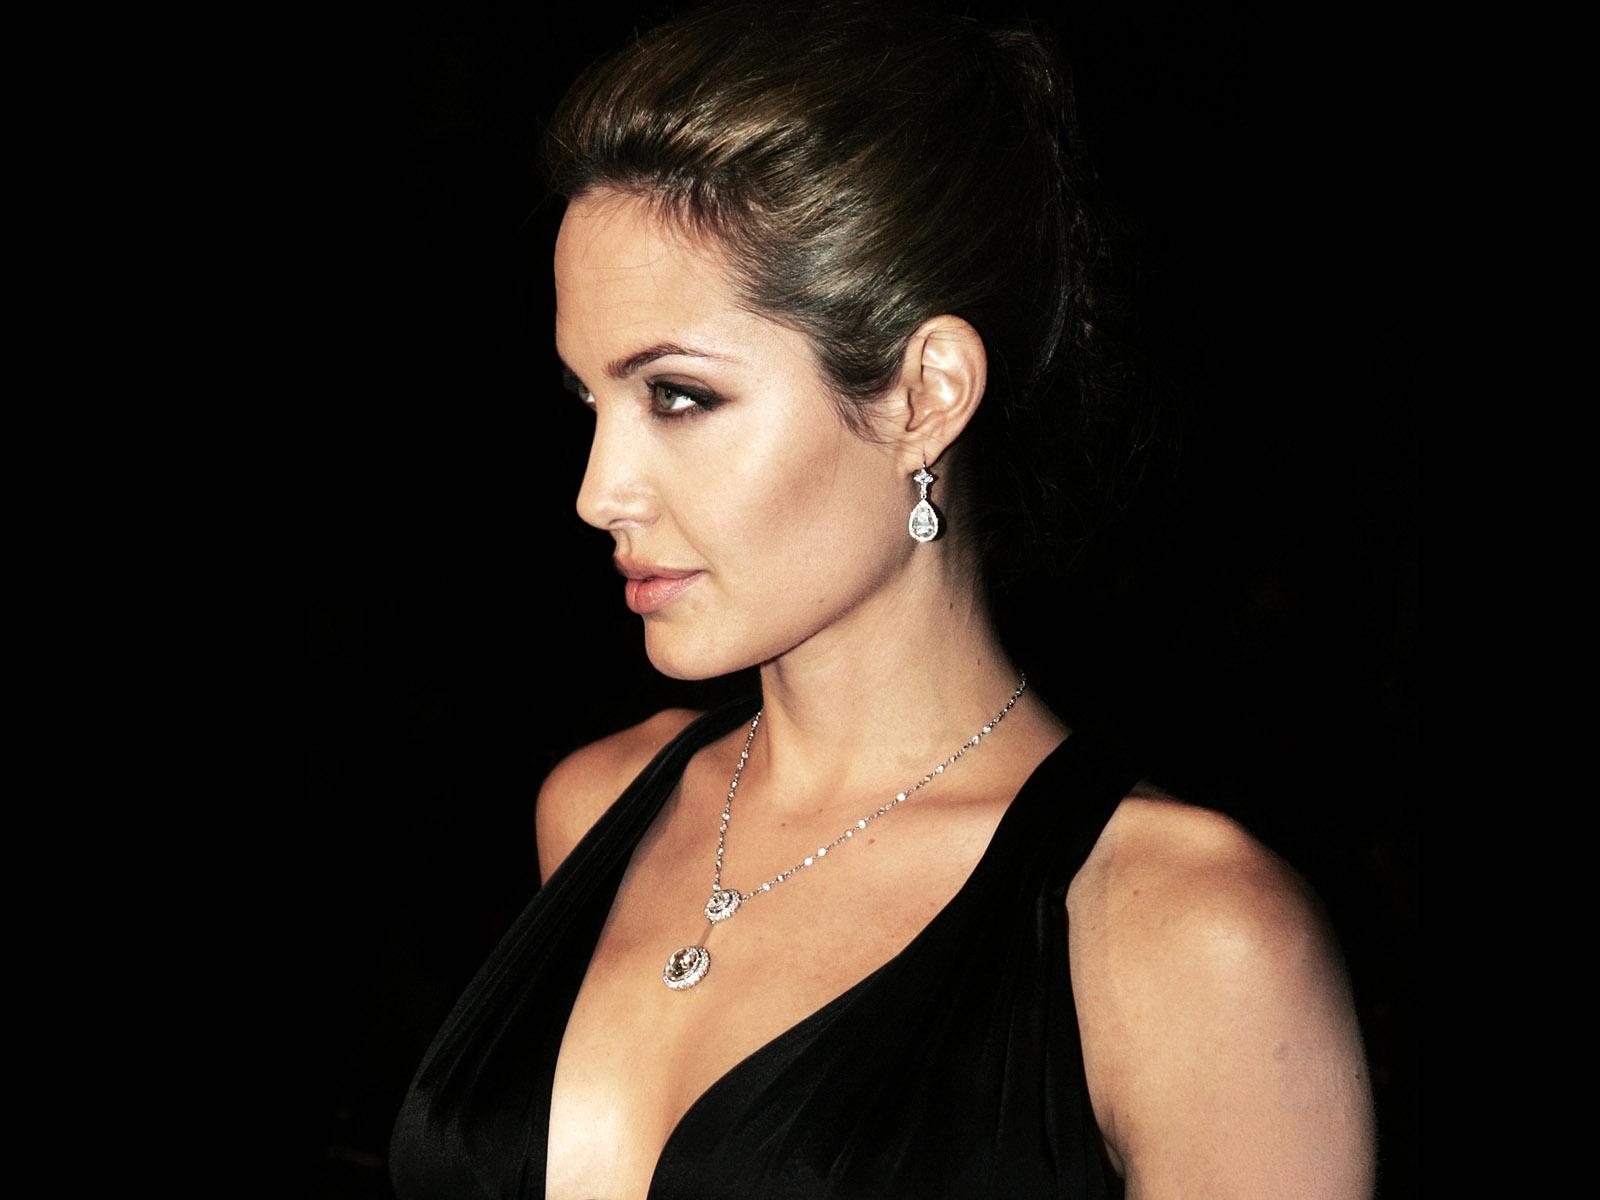 Kareena 3d Wallpaper Angelina Jolie Wallpapers 3d Wallpaper Nature